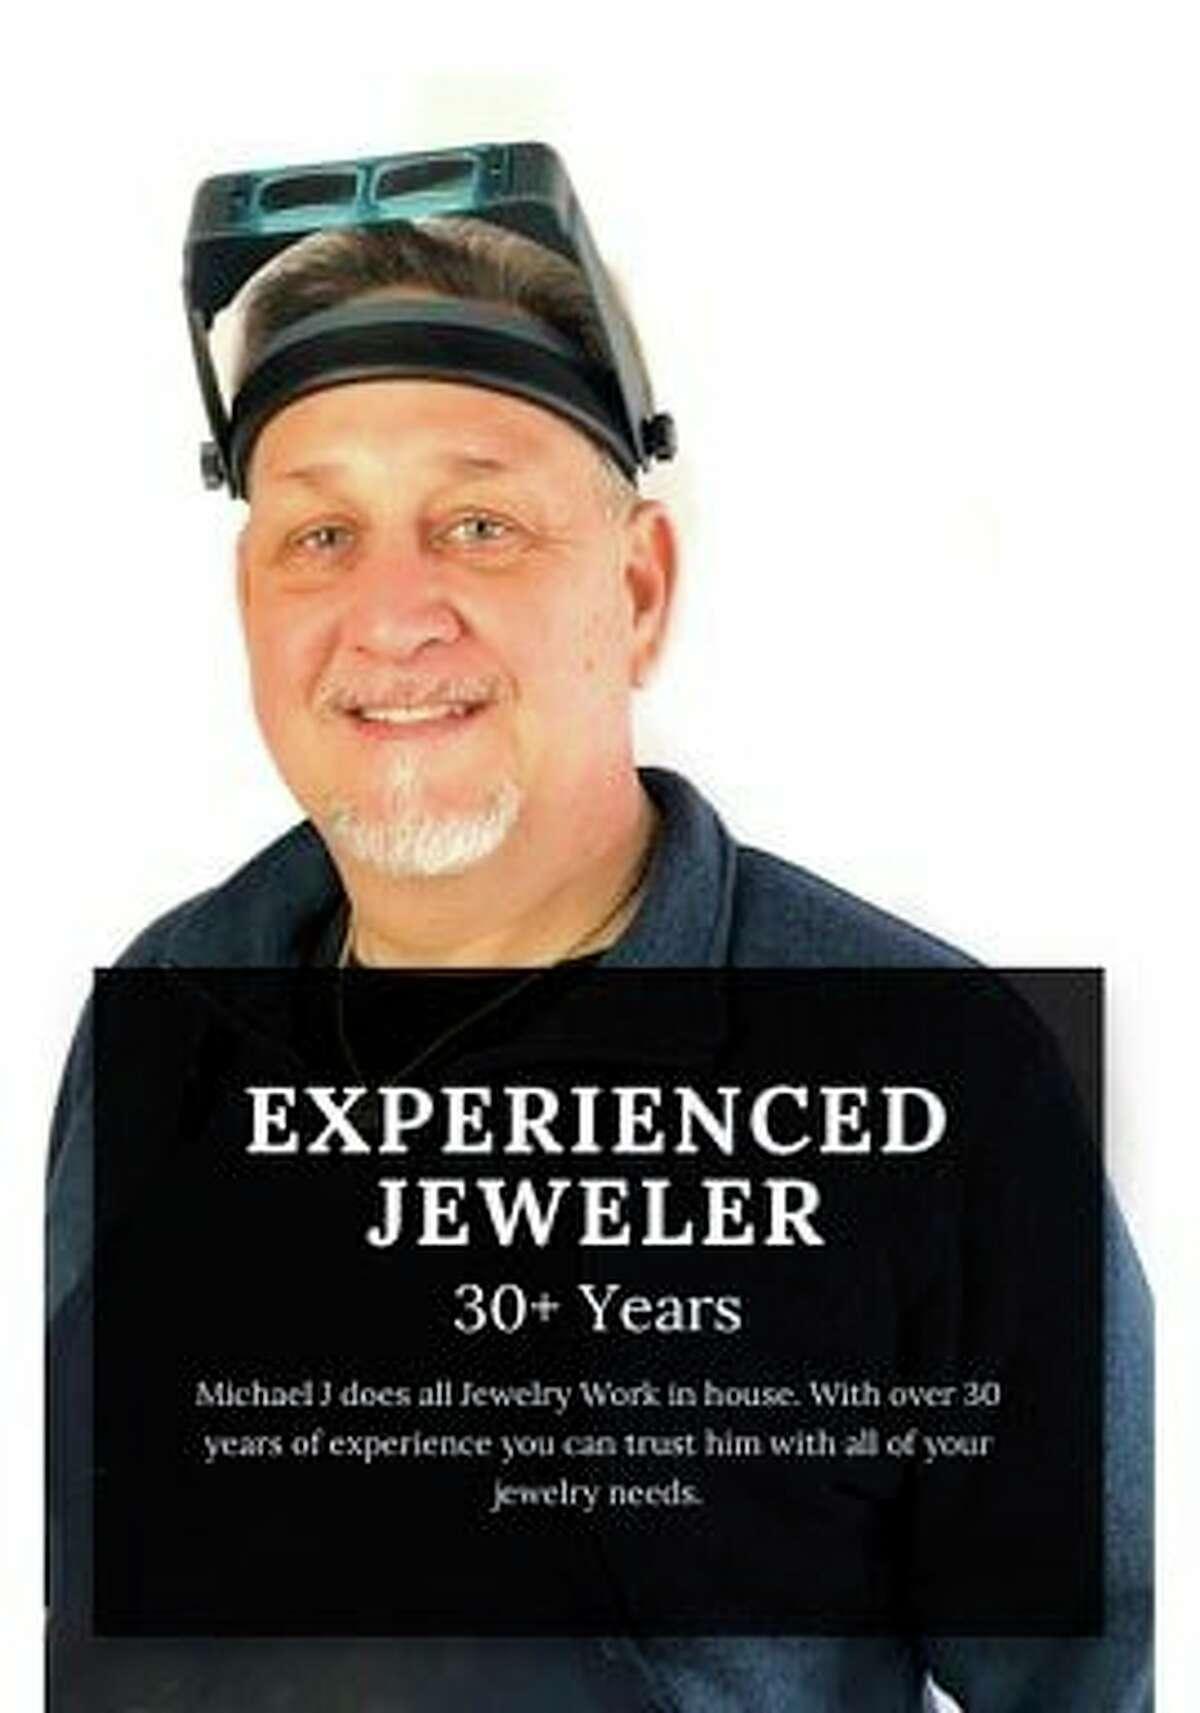 Michael Affholter of Michael J'sDesign Studio & Goldsmith Shop. (Courtesy Photo)